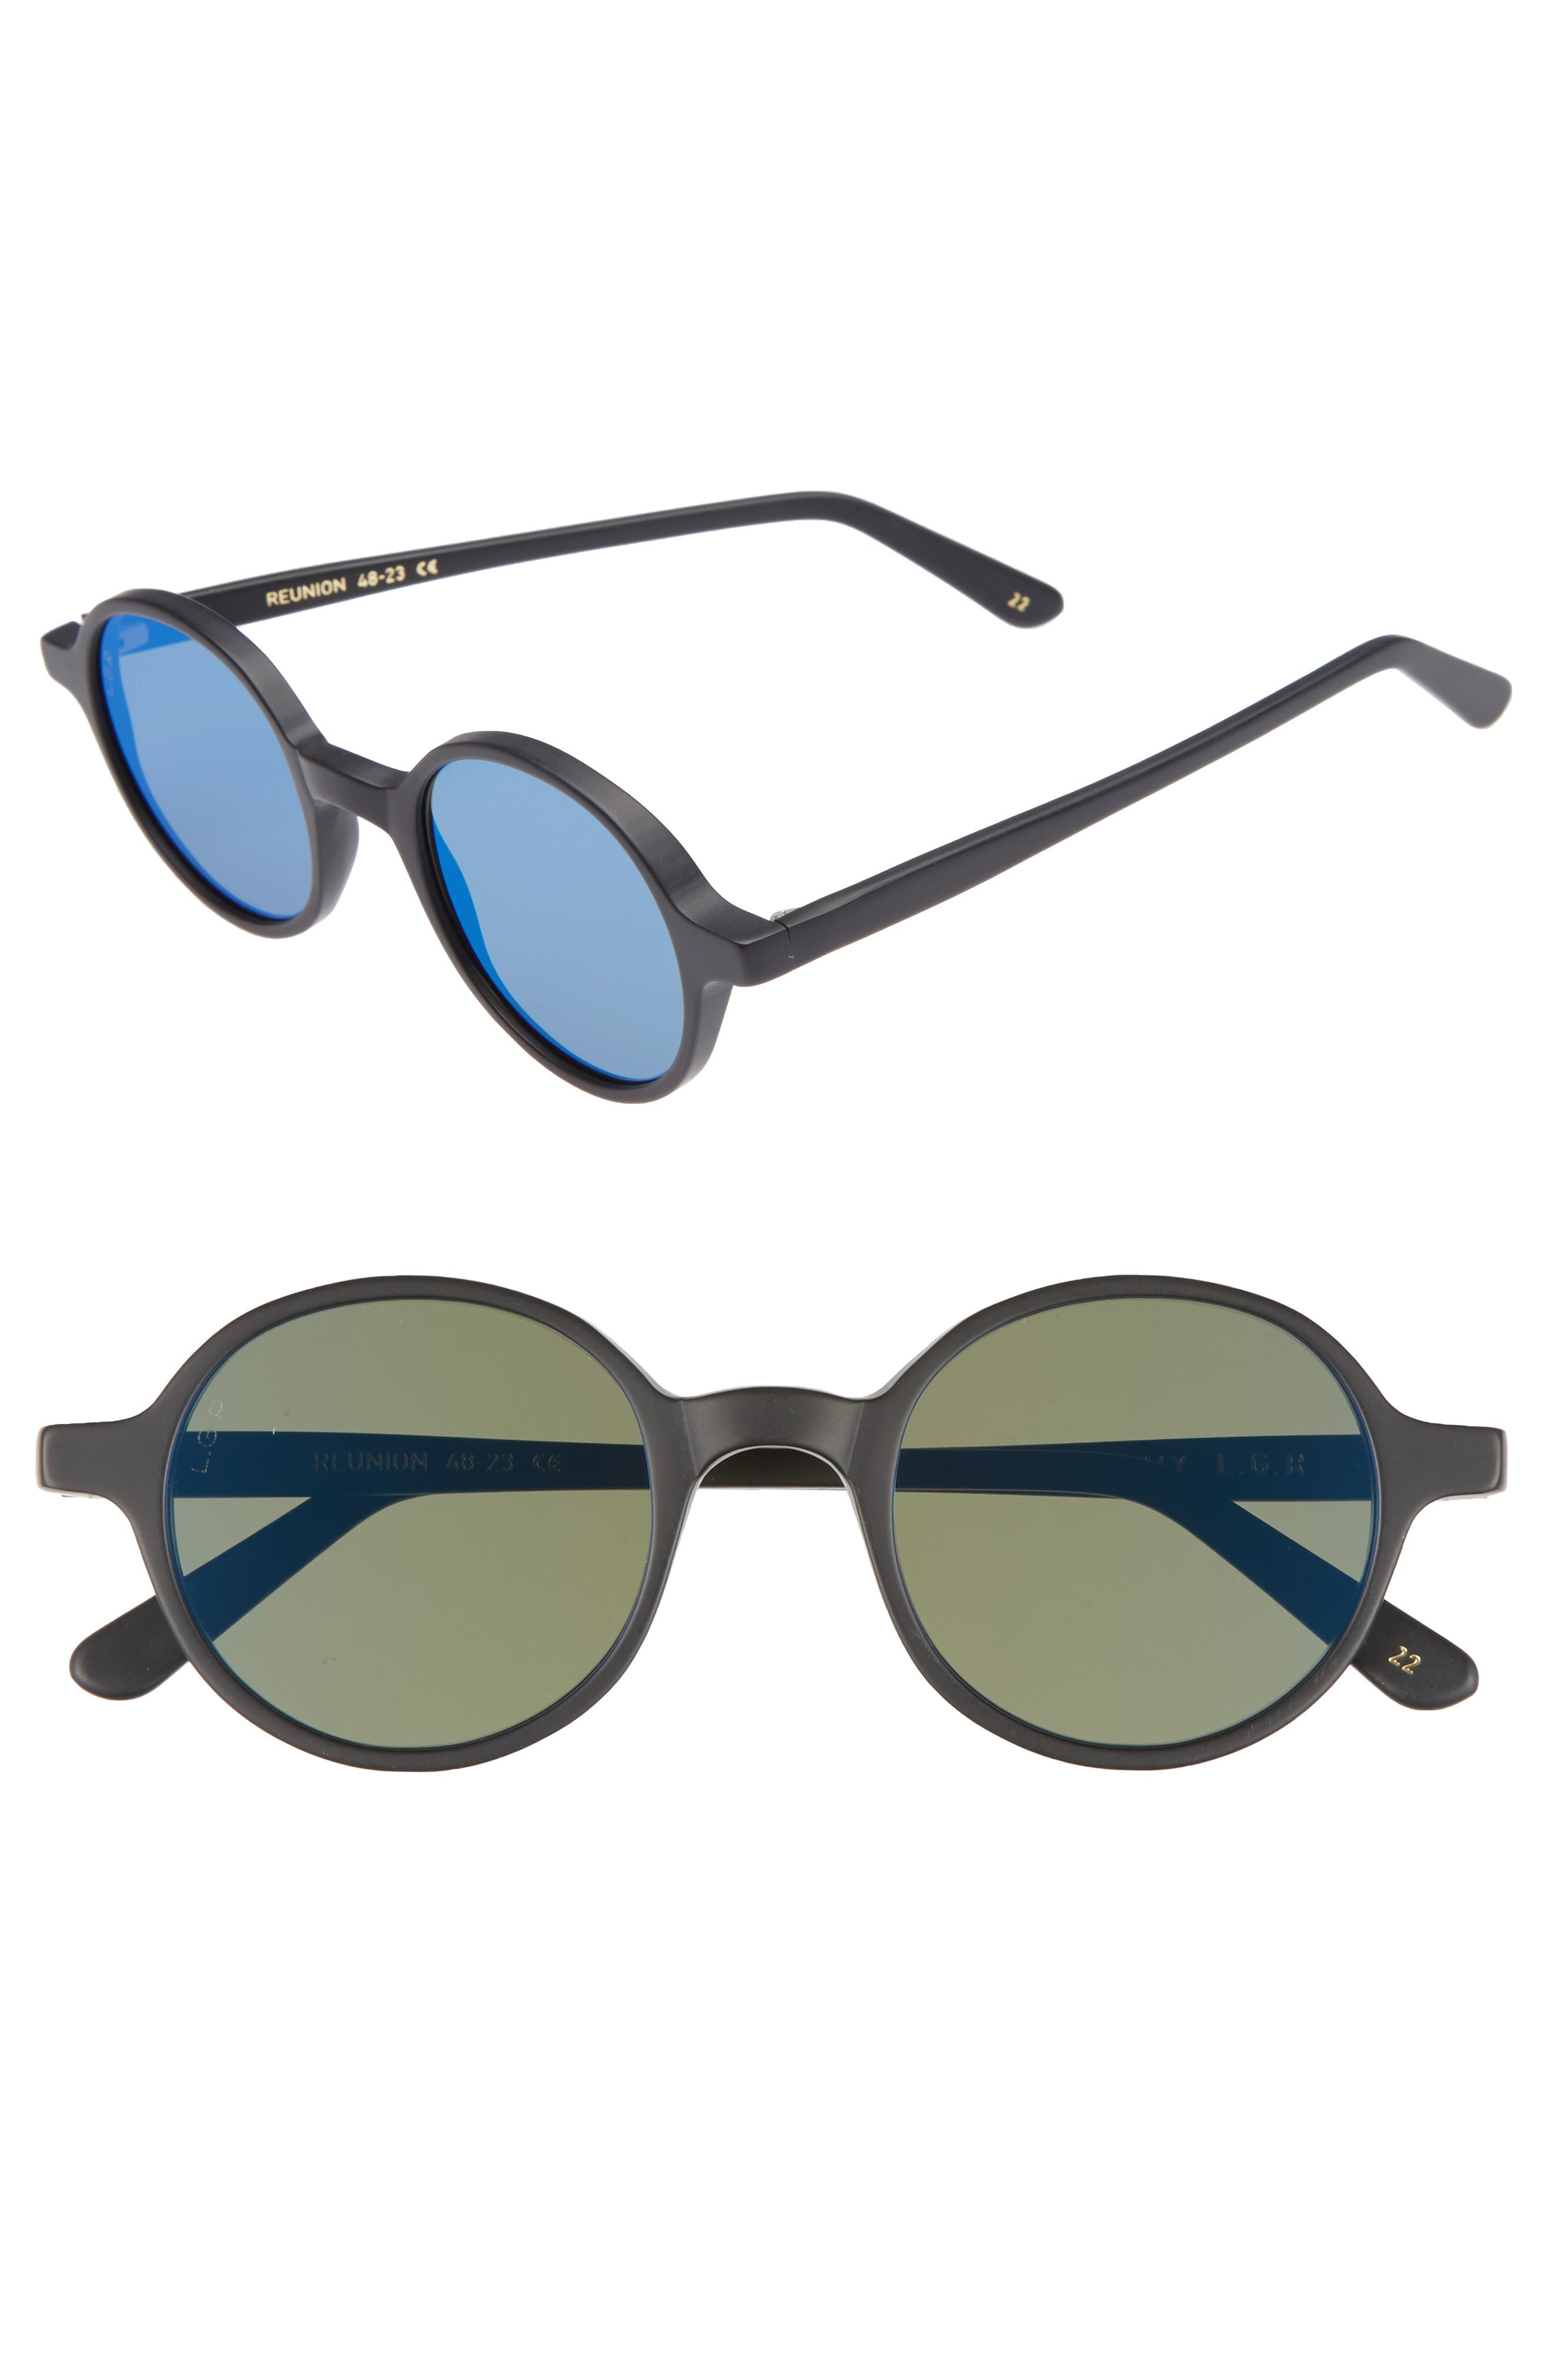 Reunion 48mm Sunglasses,                         Main,                         color, 001